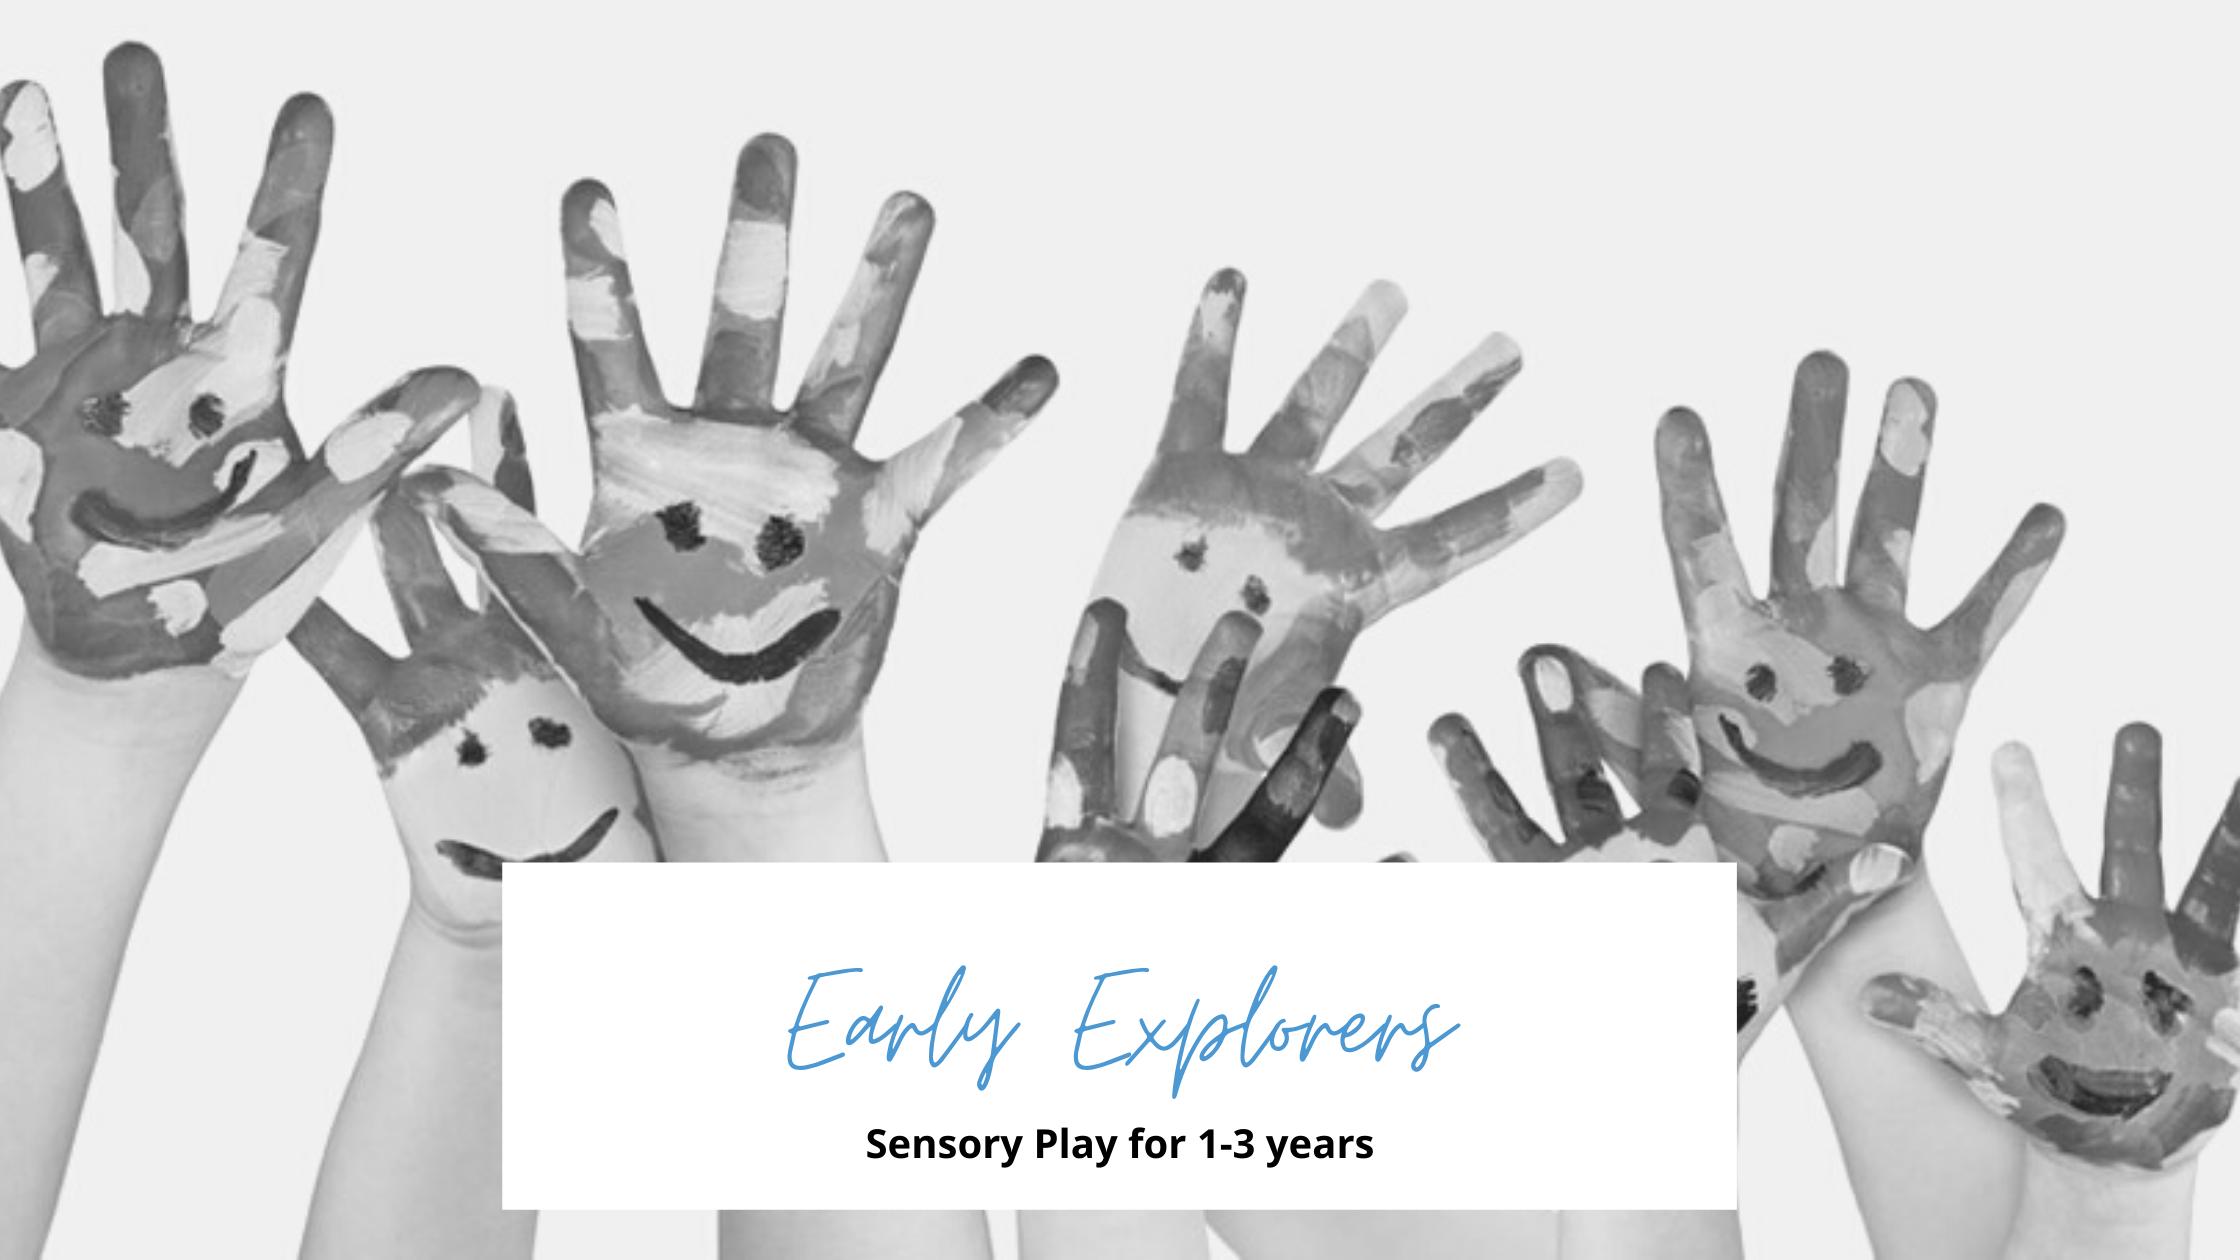 Early Explorers sensory play